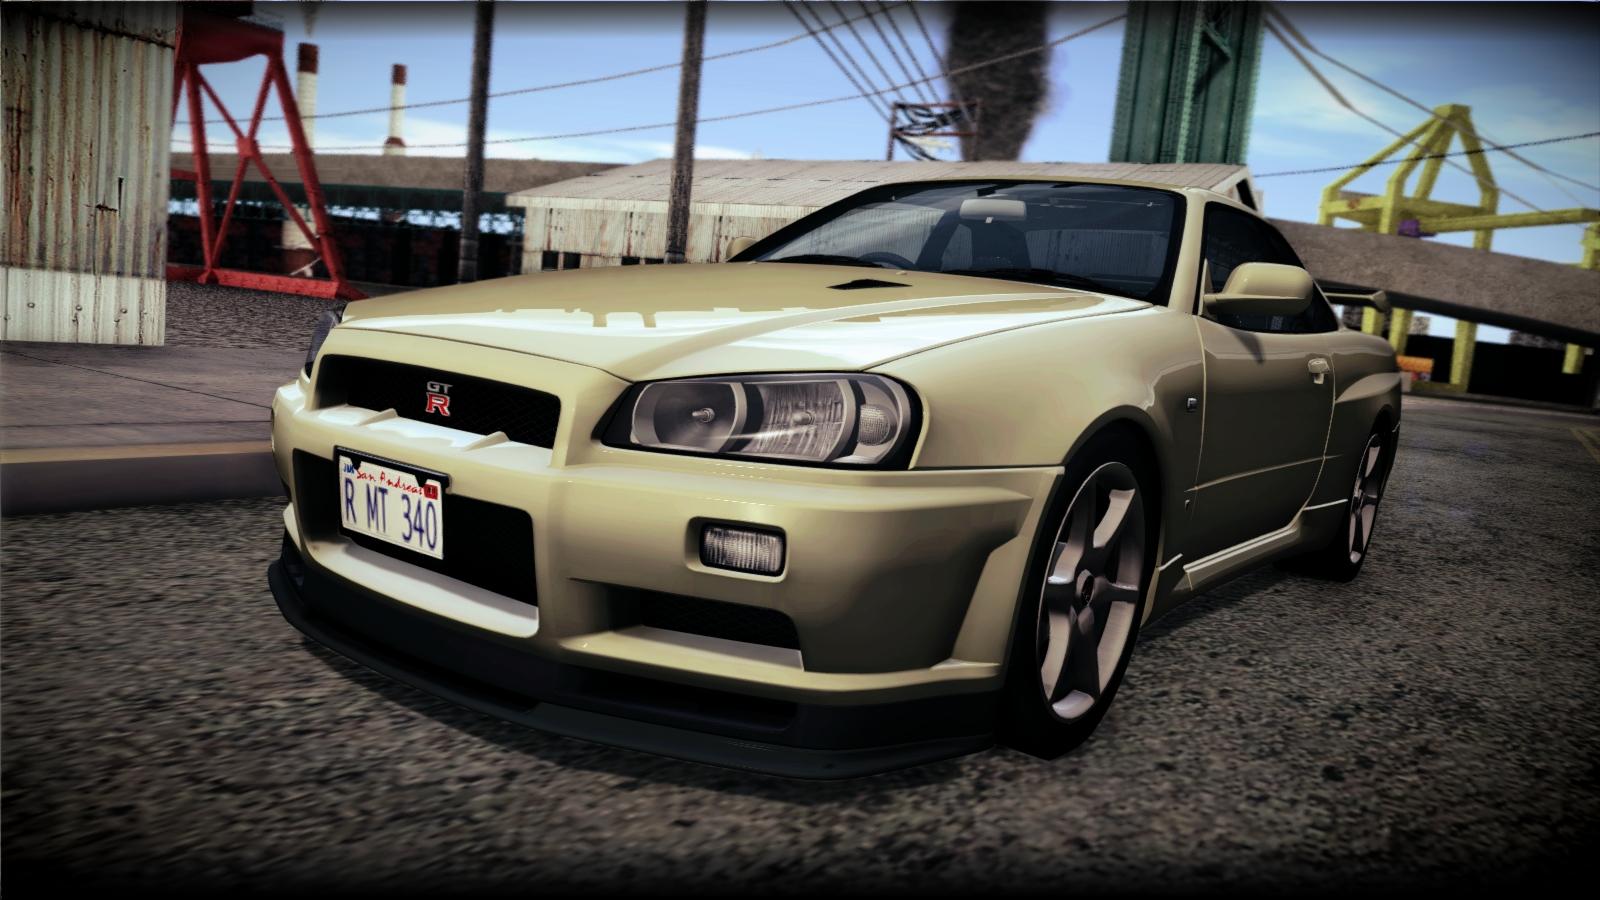 2002 Nissan Skyline GTR (R34)